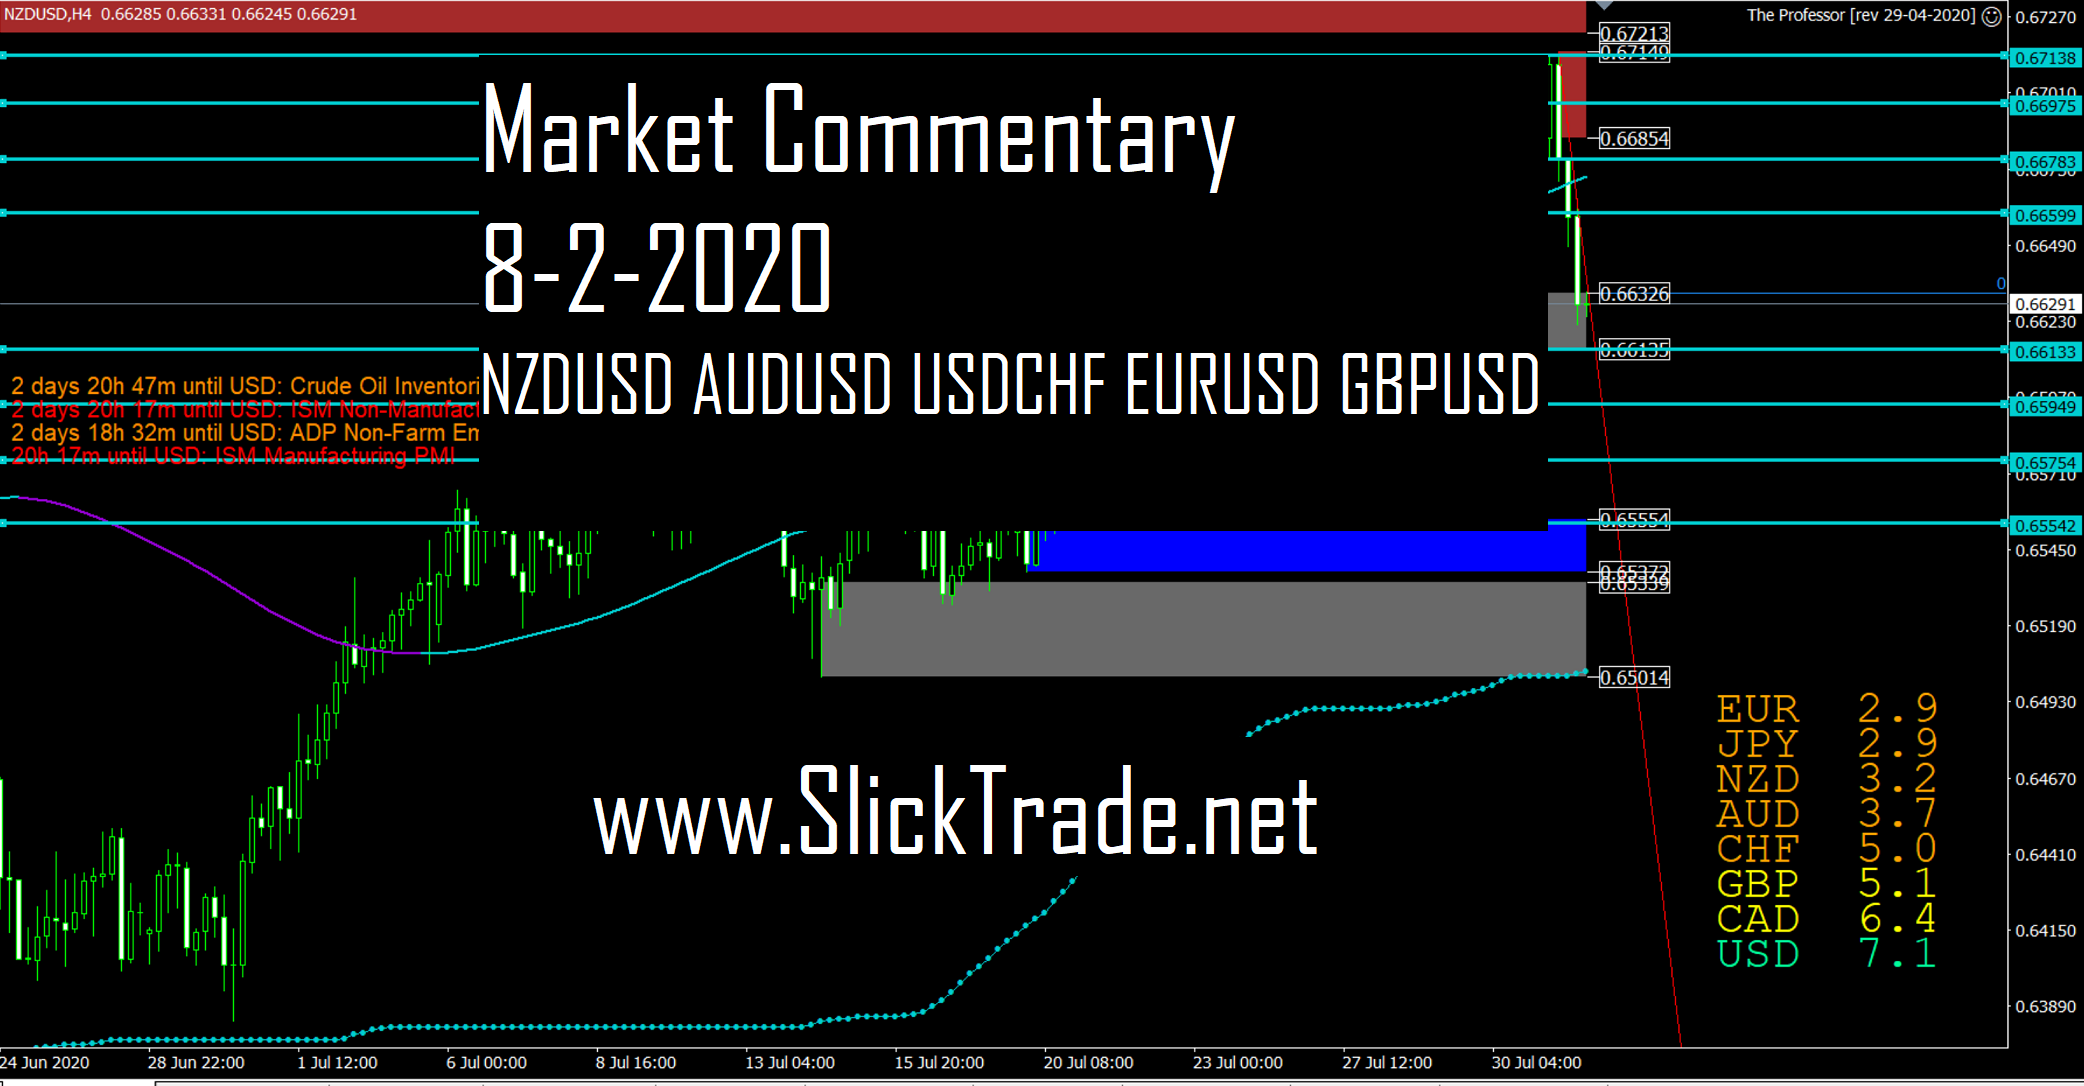 Market Commentary 8-2-2020 - NZDUSD AUDUSD USDCHF EURUSD GBPUSD